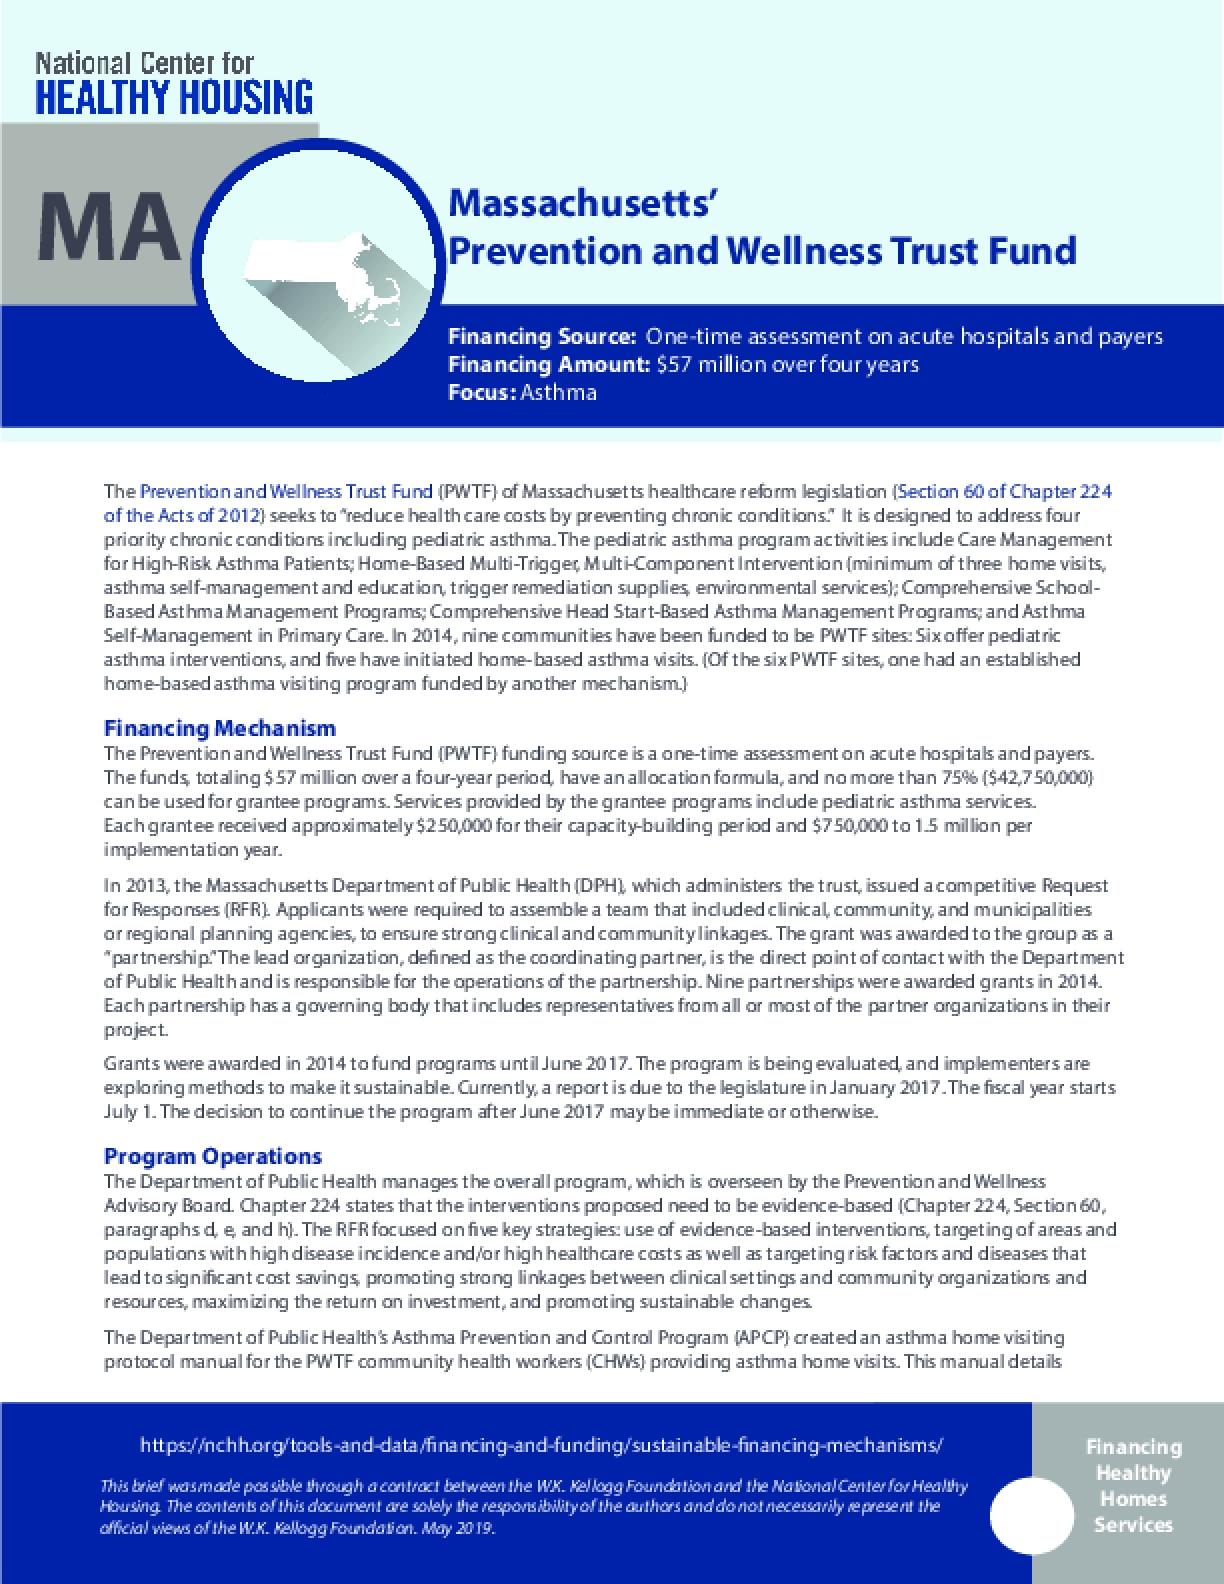 Massachusetts' Prevention and Wellness Trust Fund